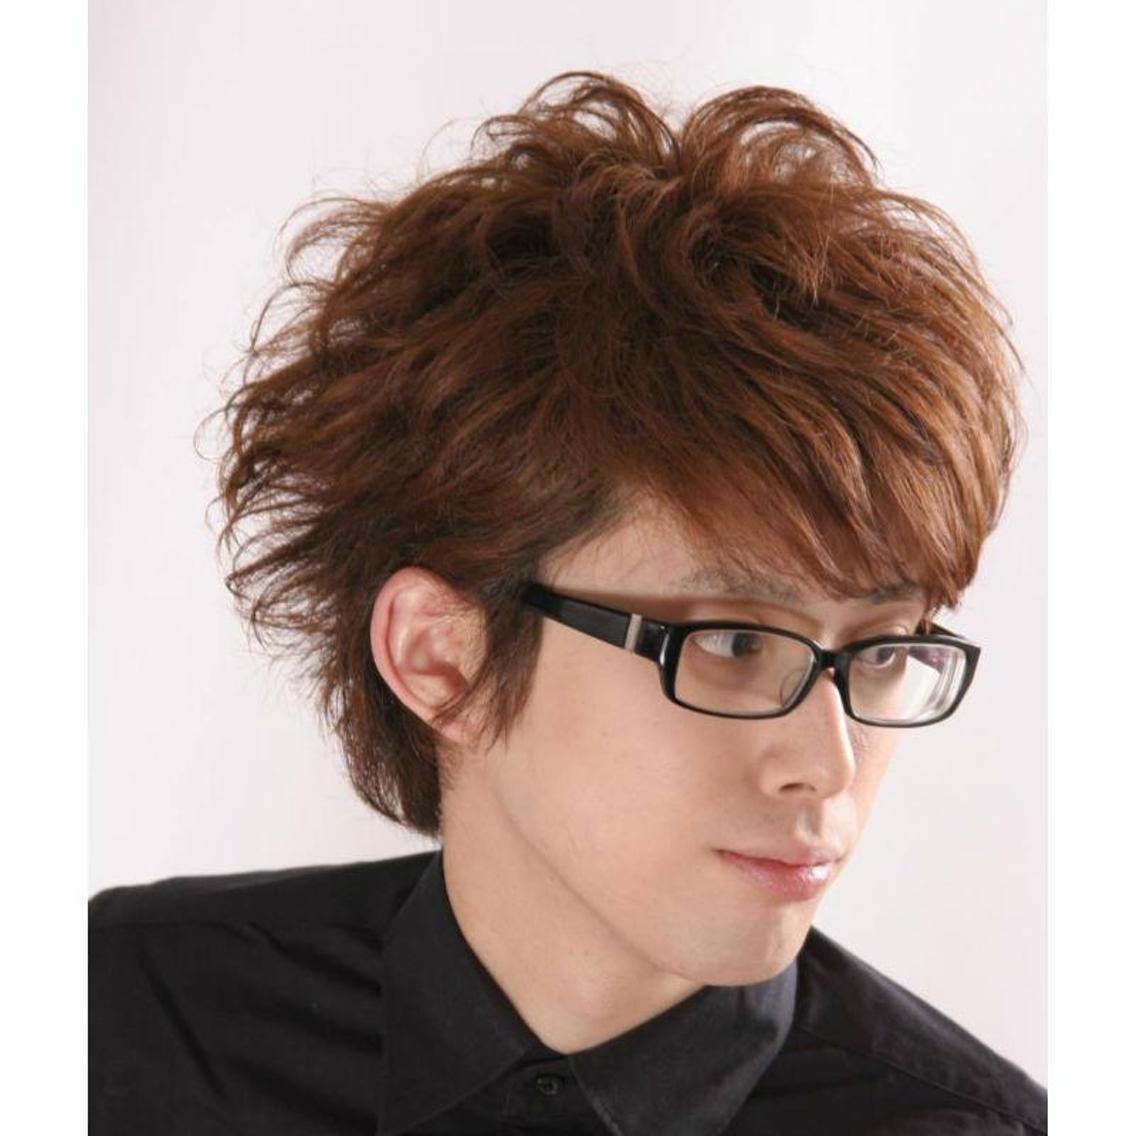 HAIR SPACE COURAGE 西町店所属・日原 史博の掲載